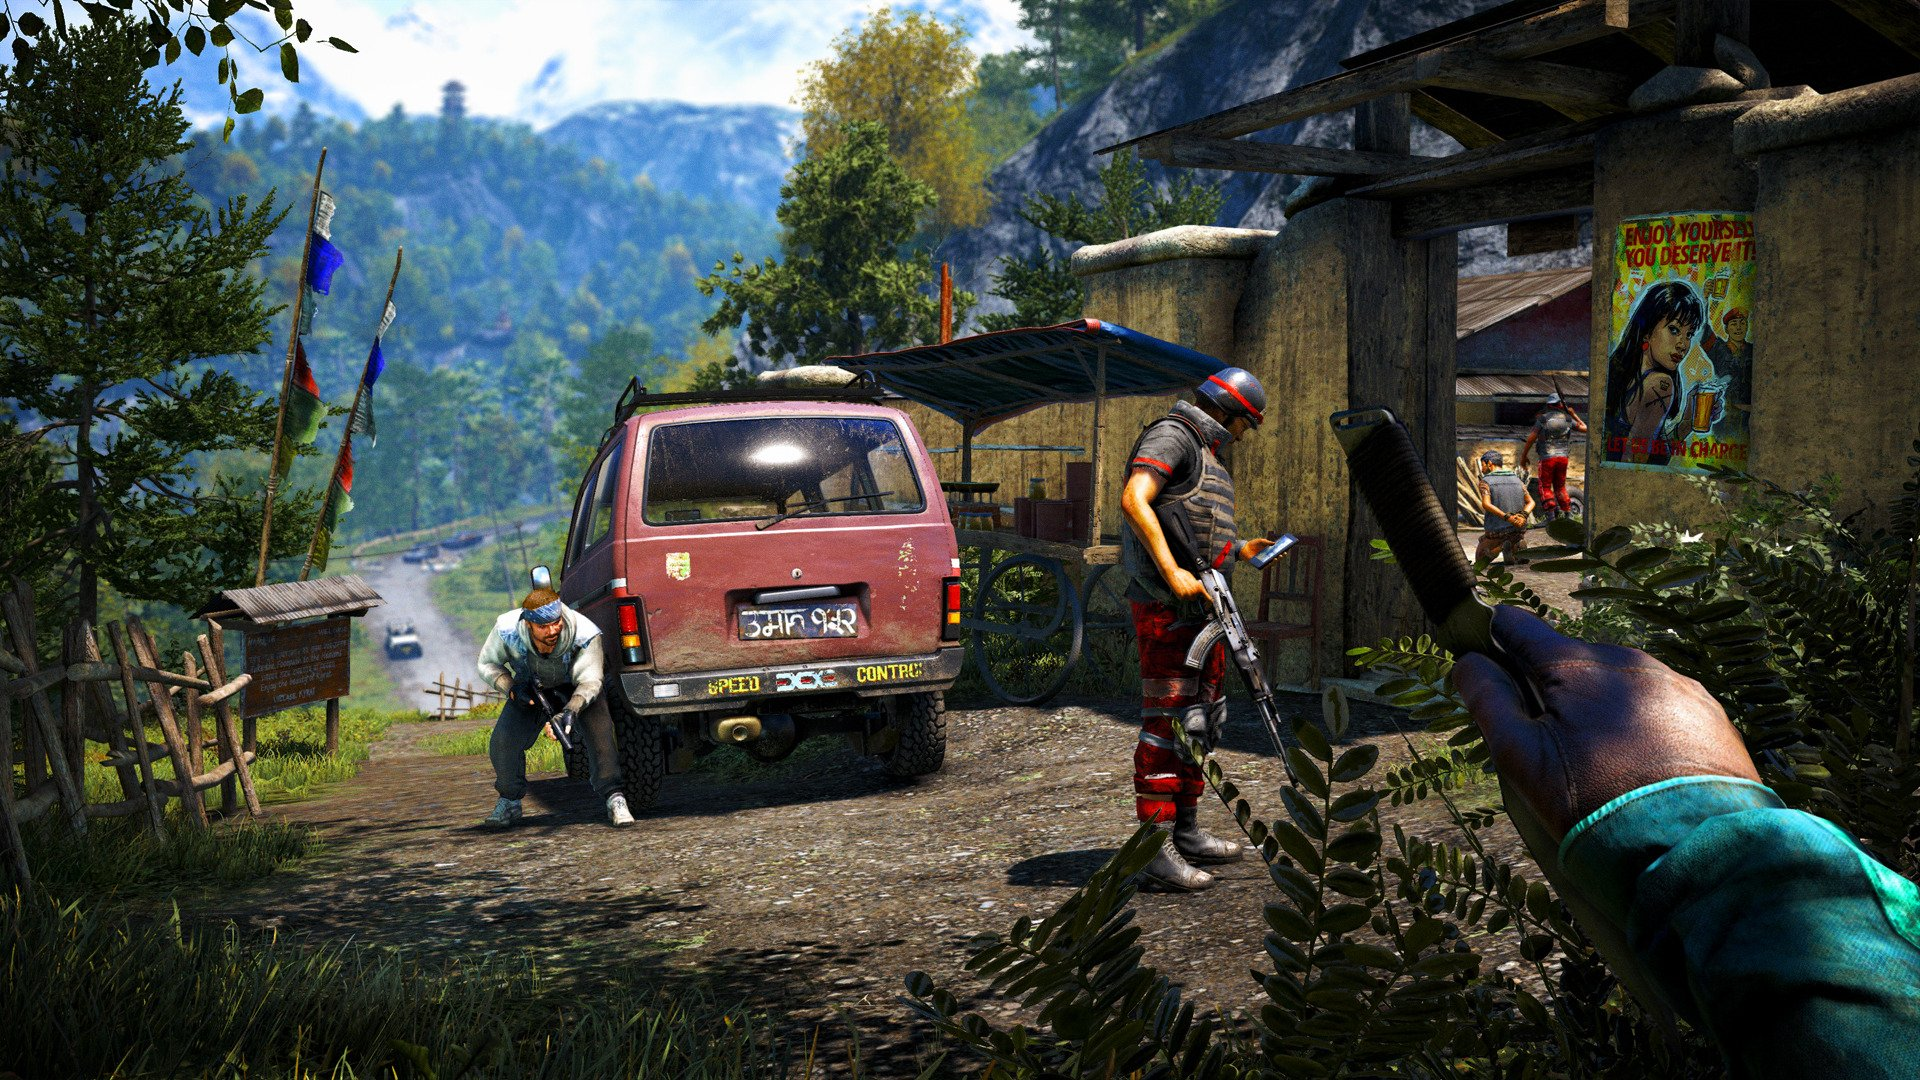 http://i11c.3djuegos.com/juegos/10320/far_cry_4/fotos/set/far_cry_4-2635583.jpg